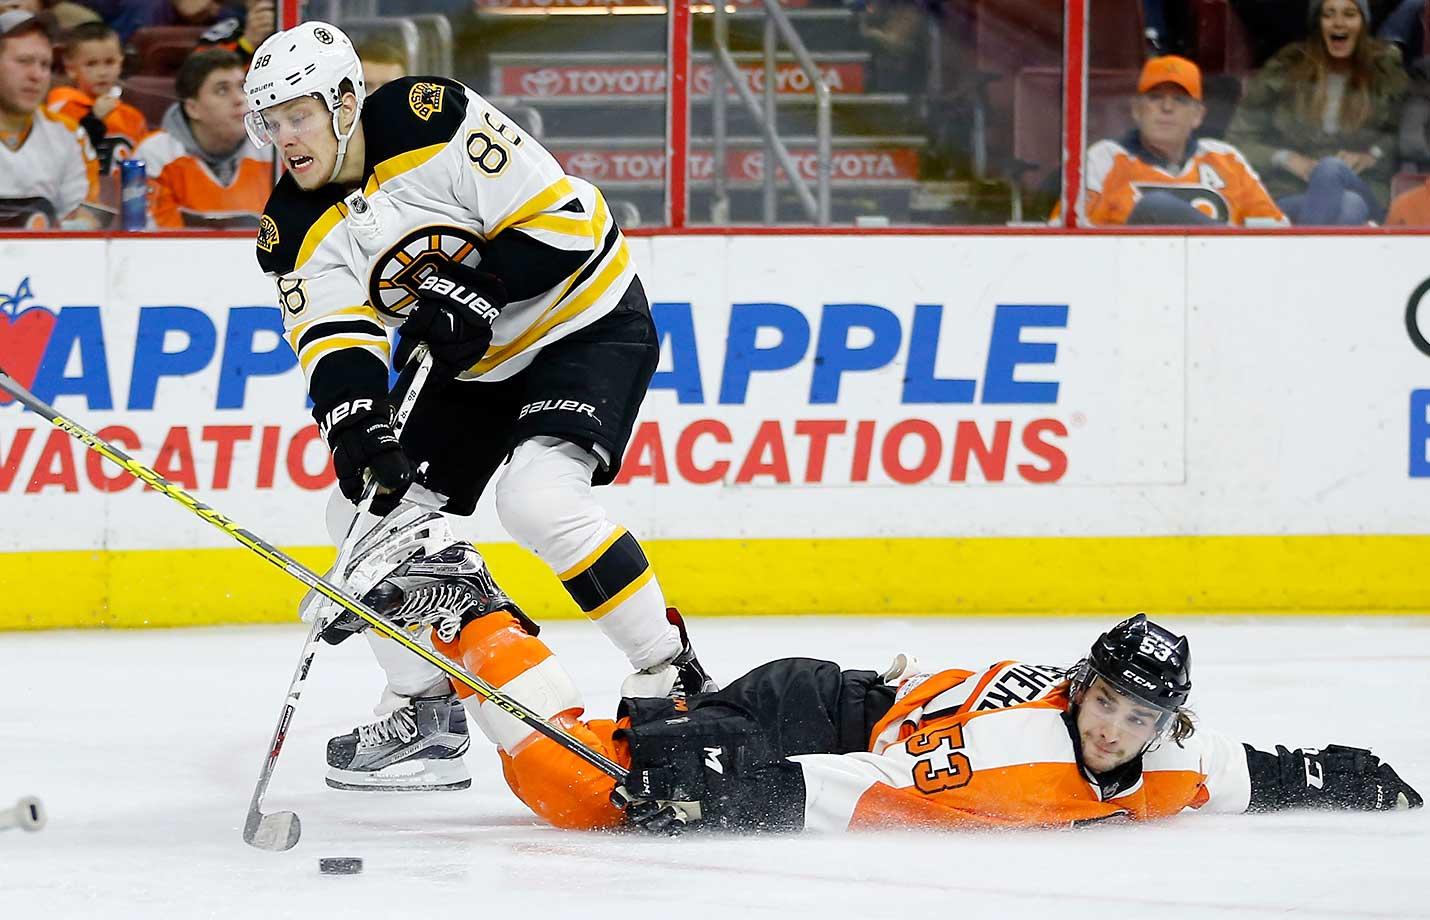 Philadelphia Flyers' Shayne Gostisbehere tries to block a shot by Boston Bruins' David Pastrnak in Philadelphia. Boston won 3-2.